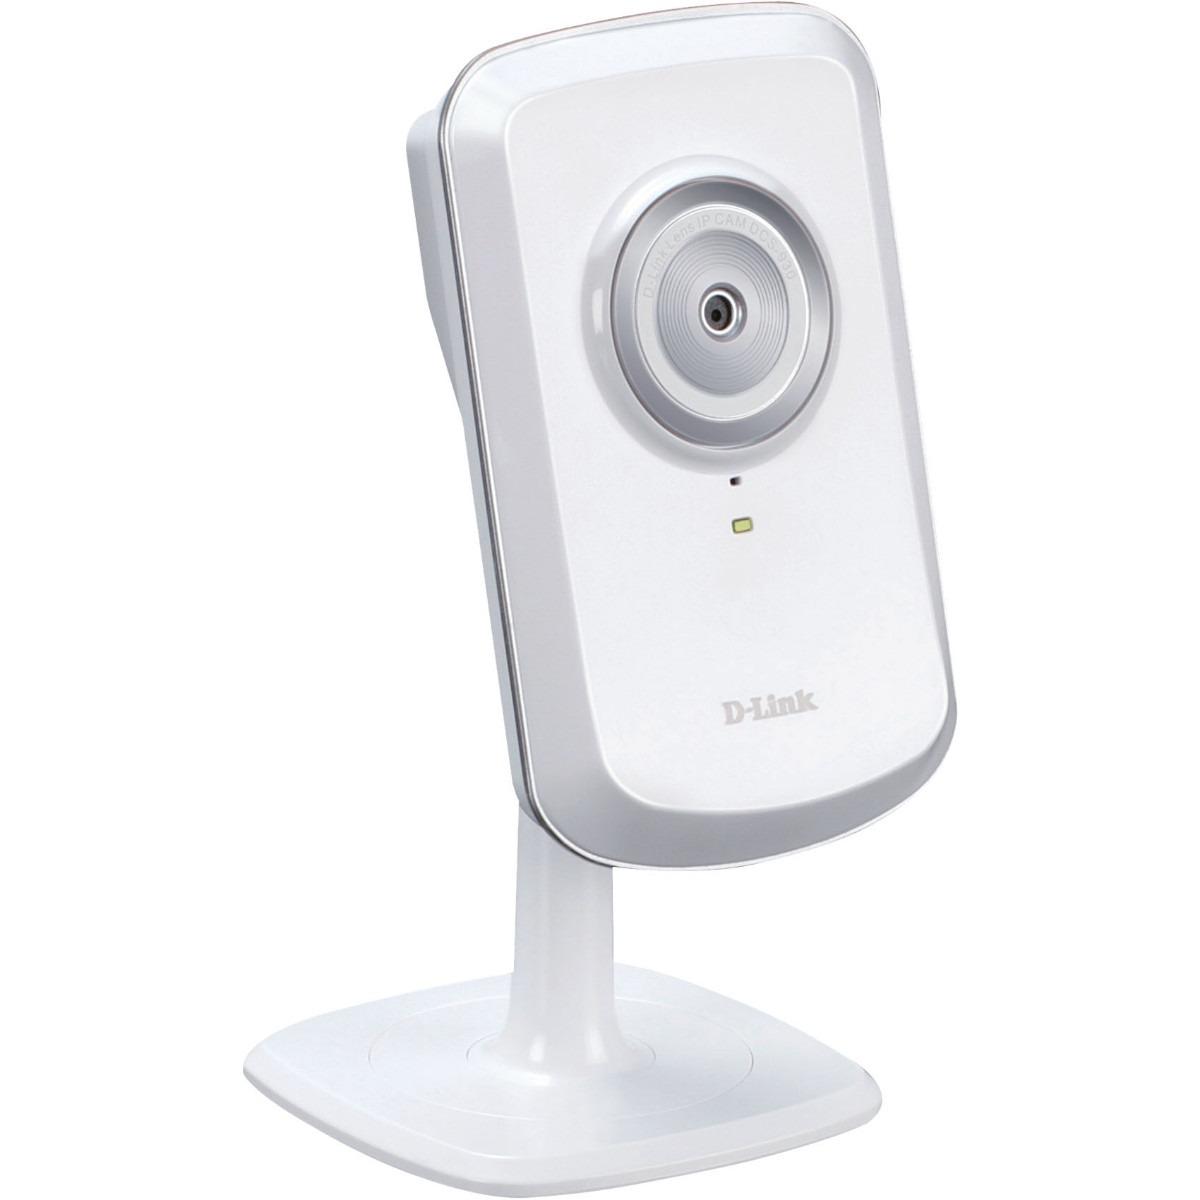 Camara ip de seguridad d link dcs 930l u s 109 99 en - Camara de seguridad ip ...